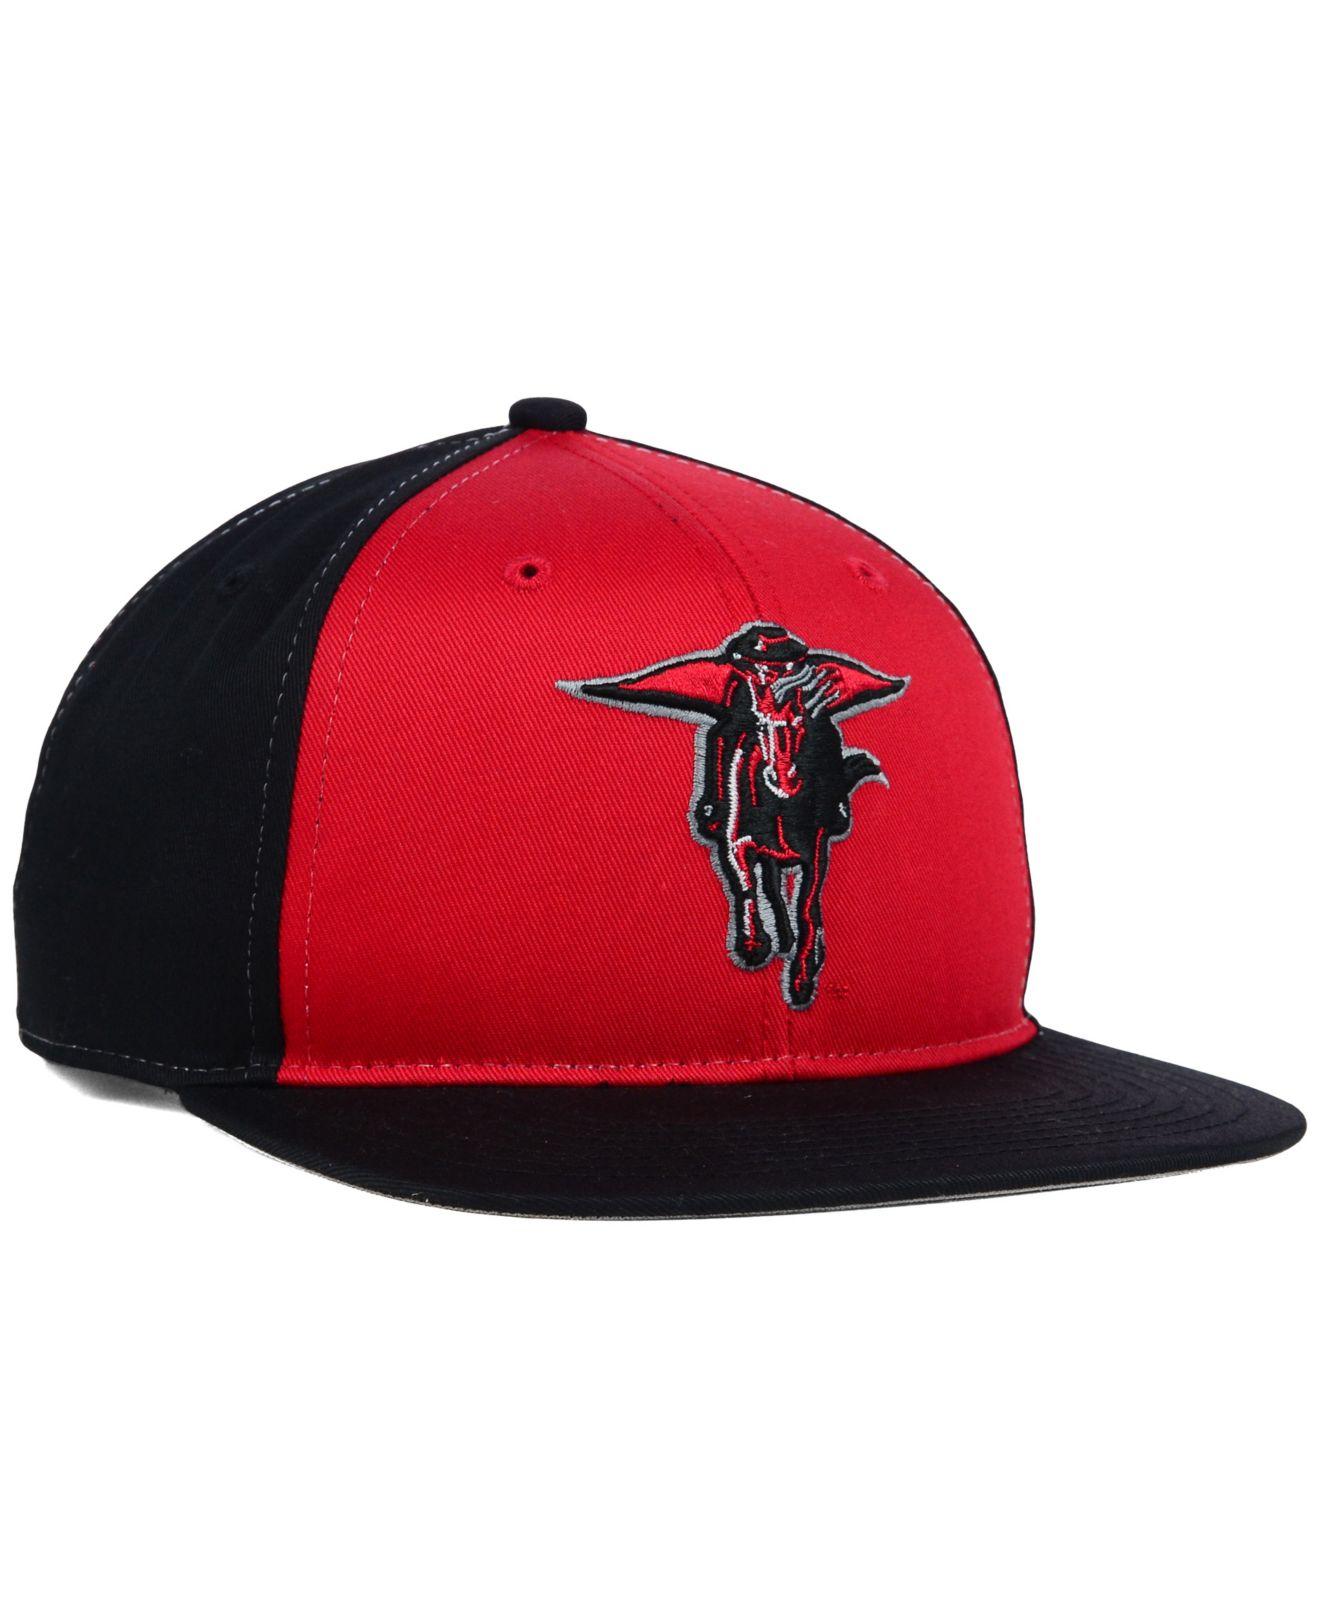 68e16522 47 Brand Kids' Texas Tech Red Raiders Snapback Cap